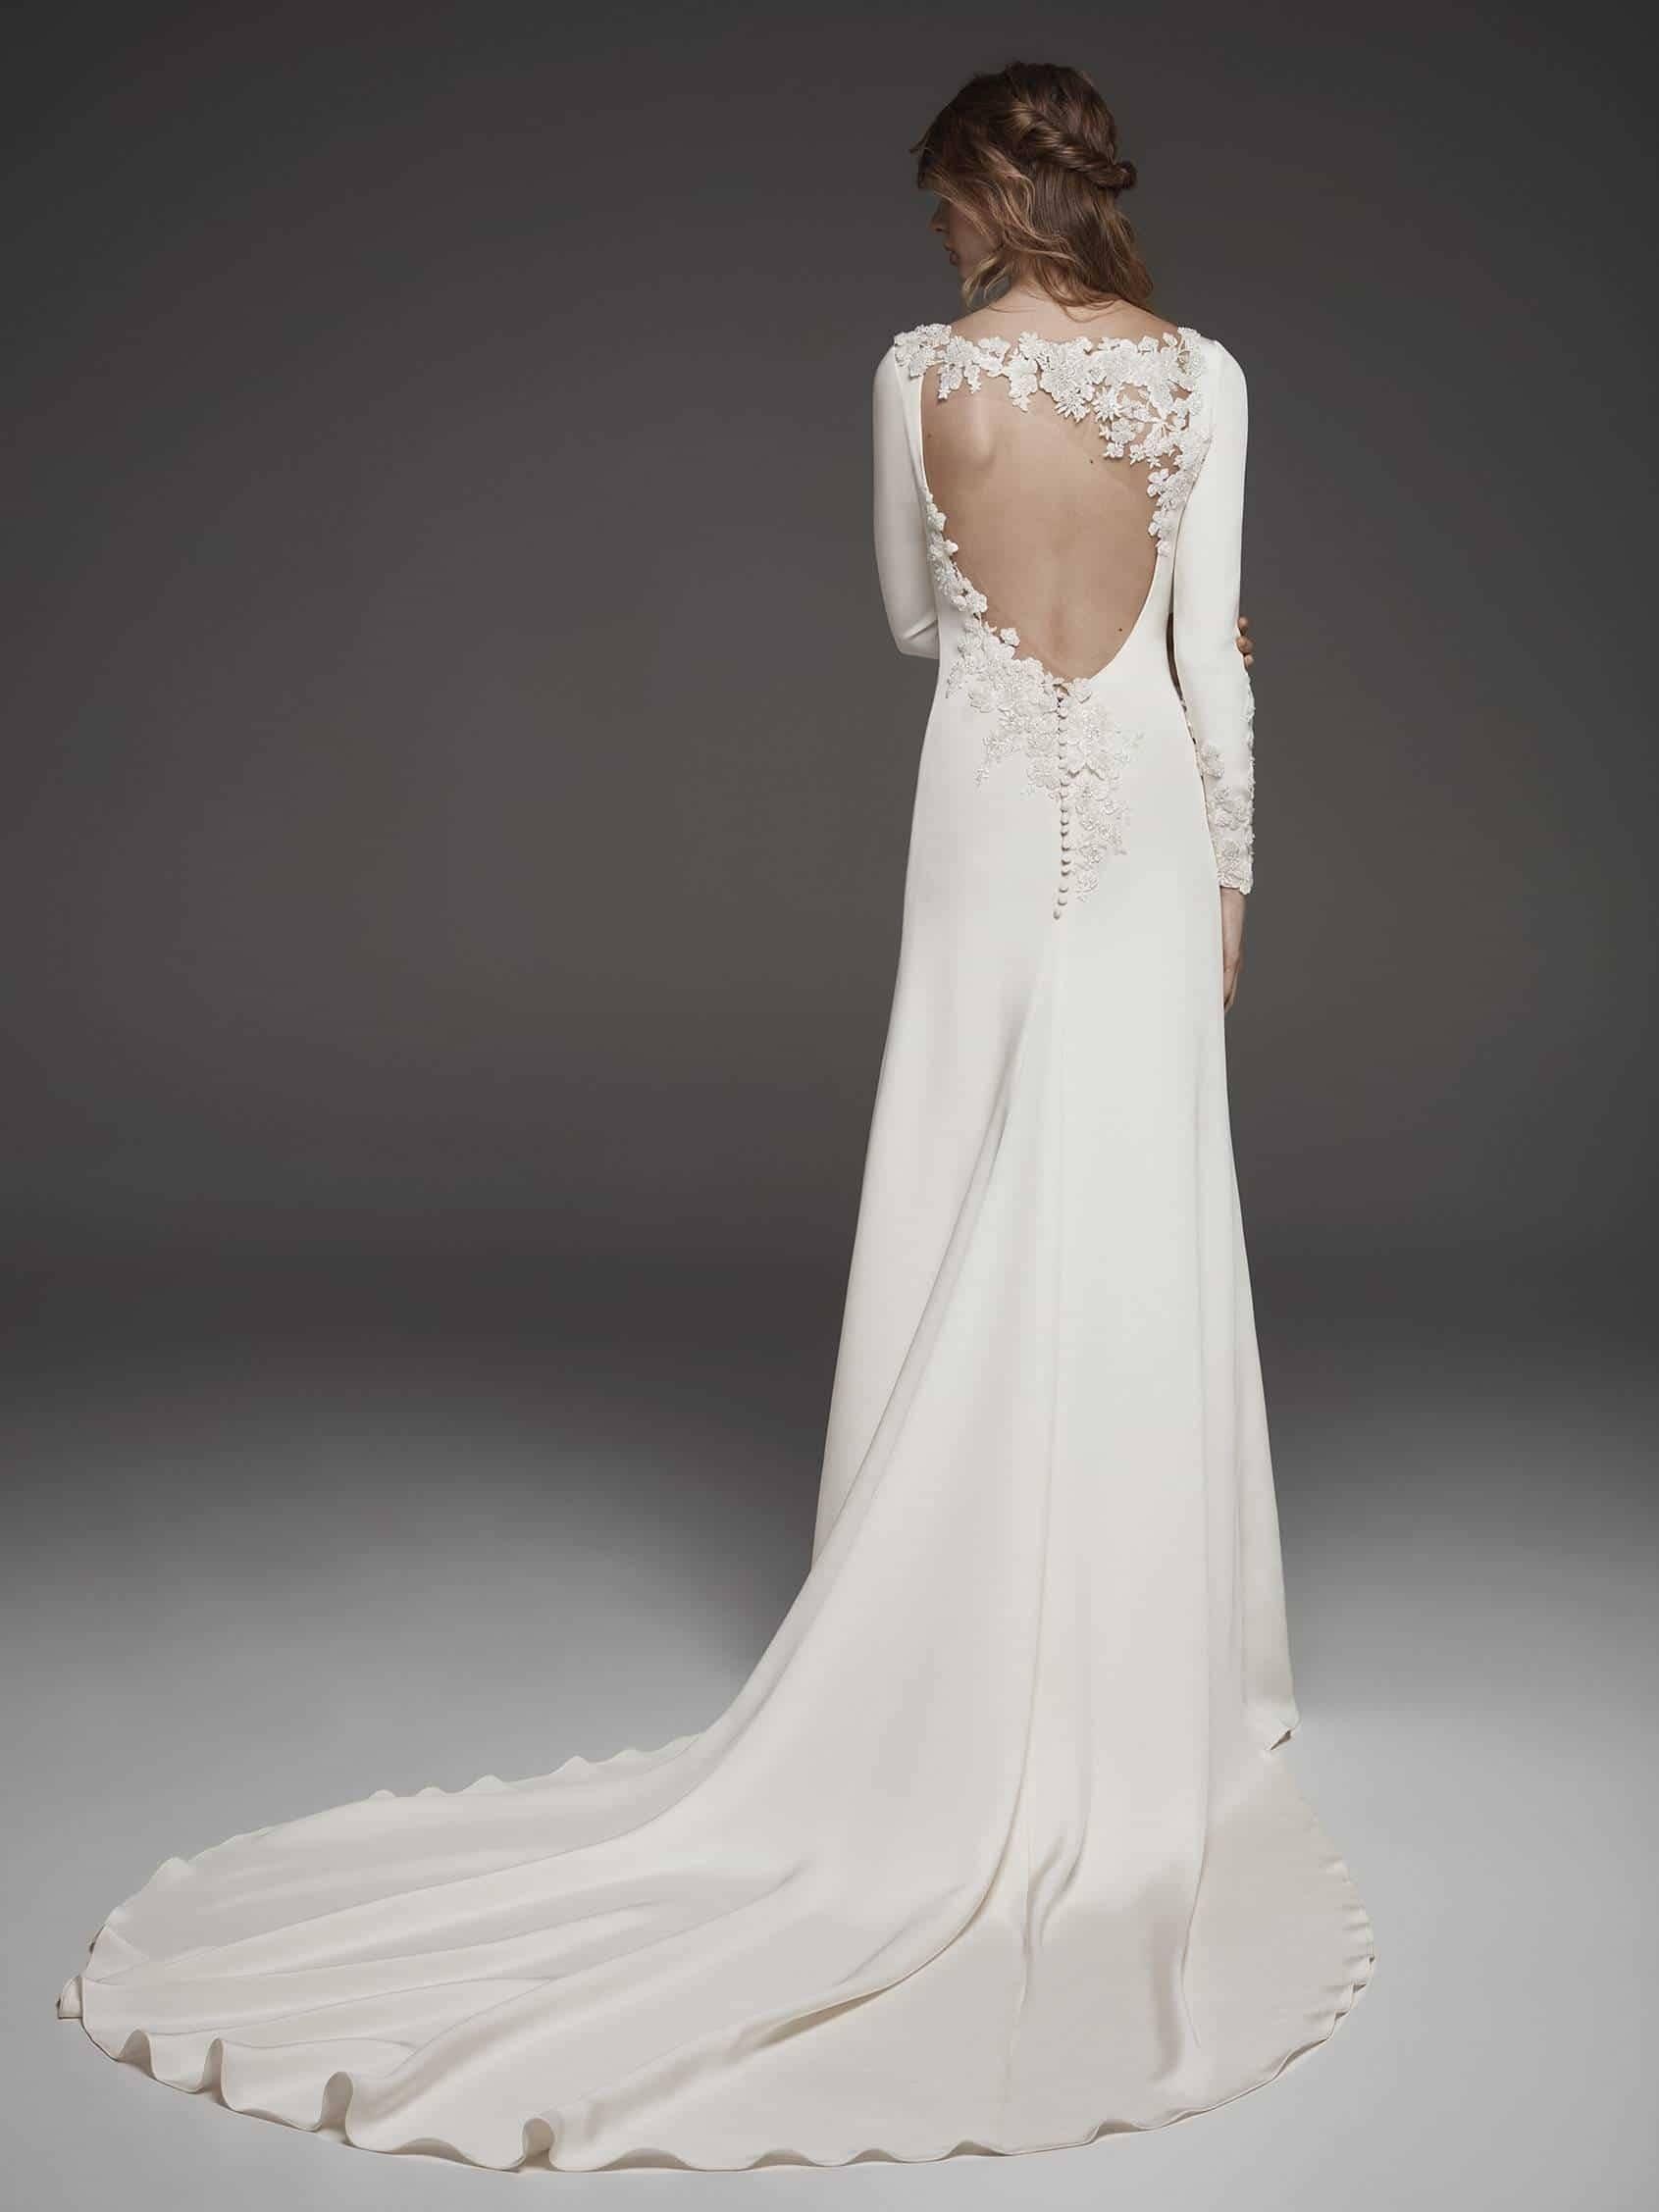 Meghan's bridal style – get the royal wedding look!